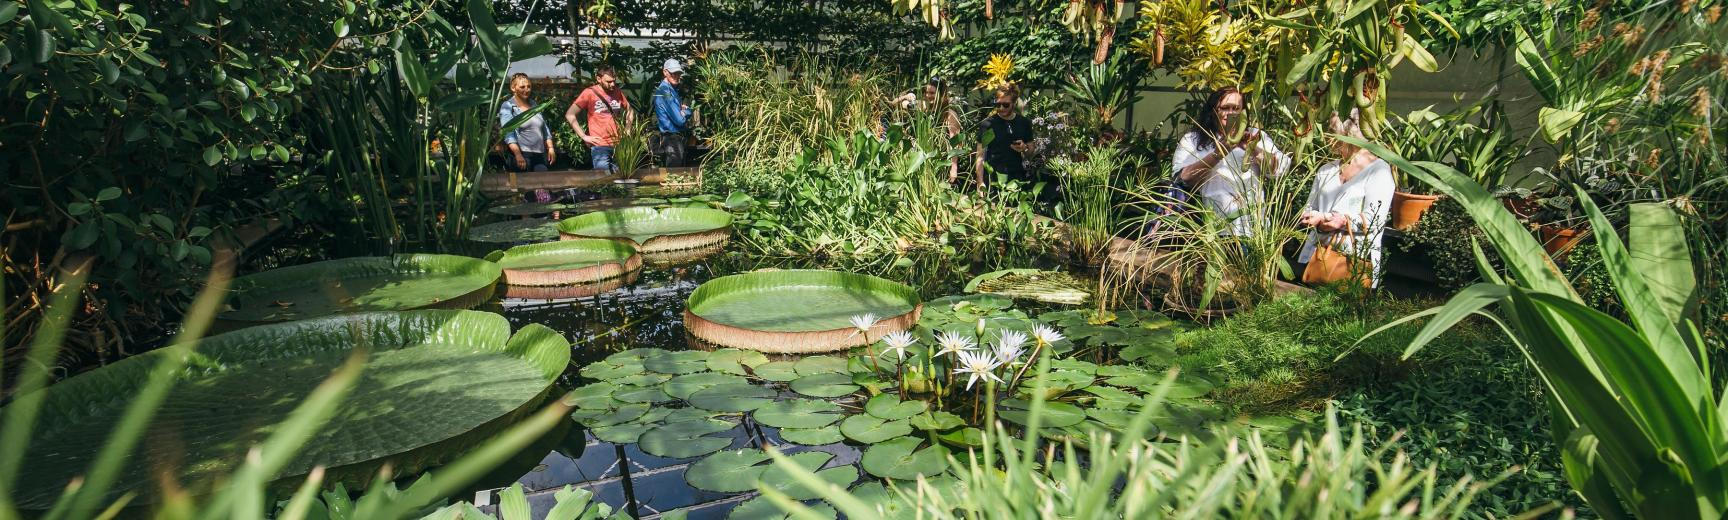 Rainforest Experience Oxford Botanic Garden And Arboretum